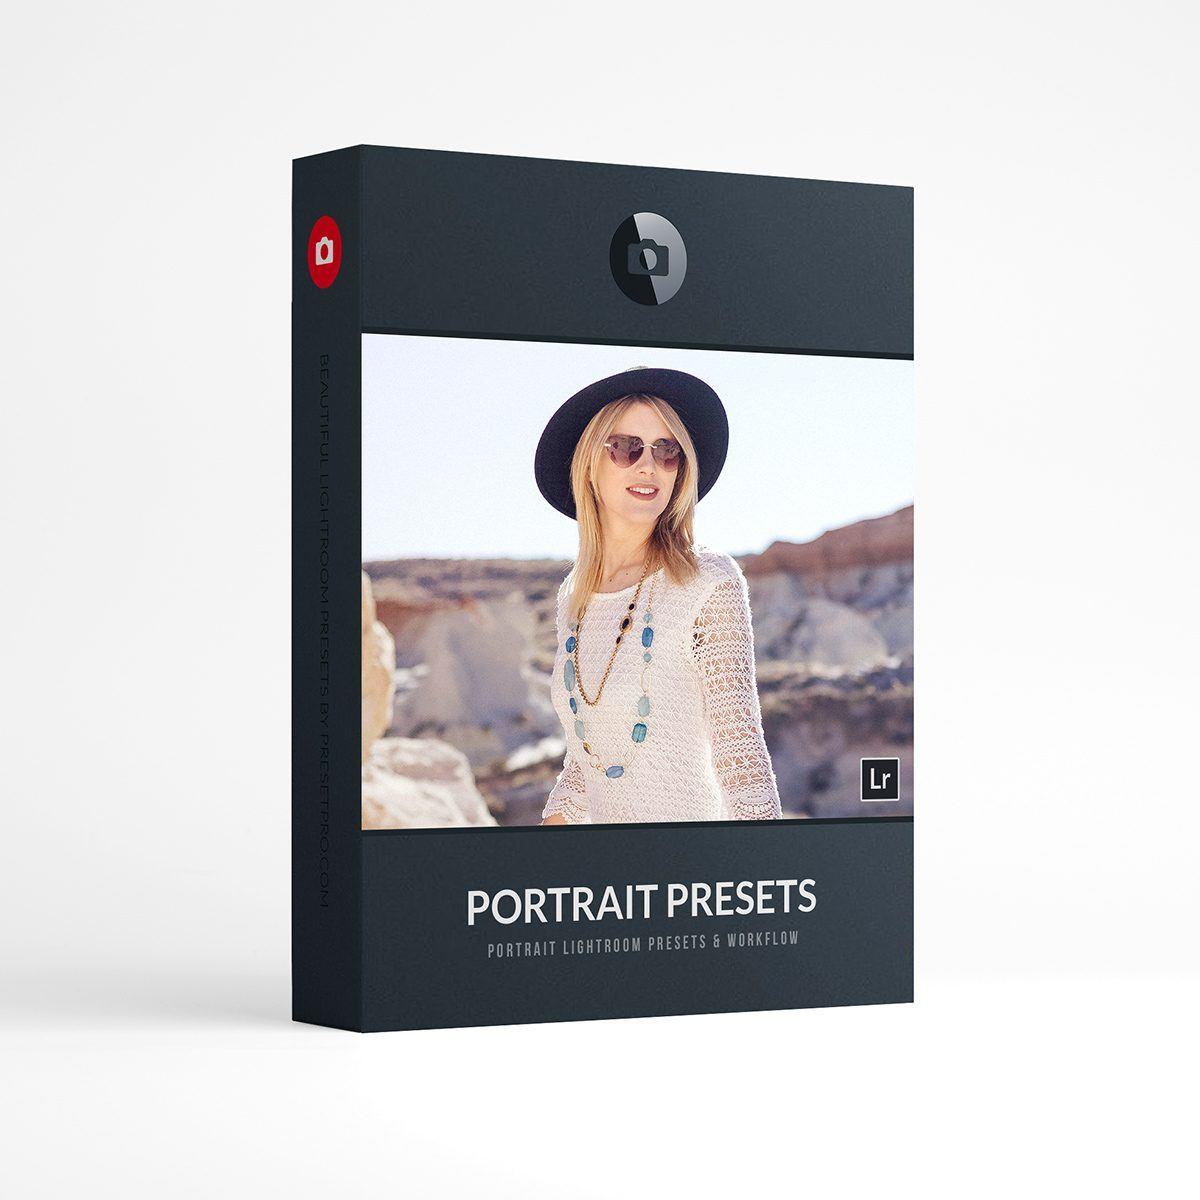 Beautiful Lightroom Presets Portrait Collection Presetpro.com